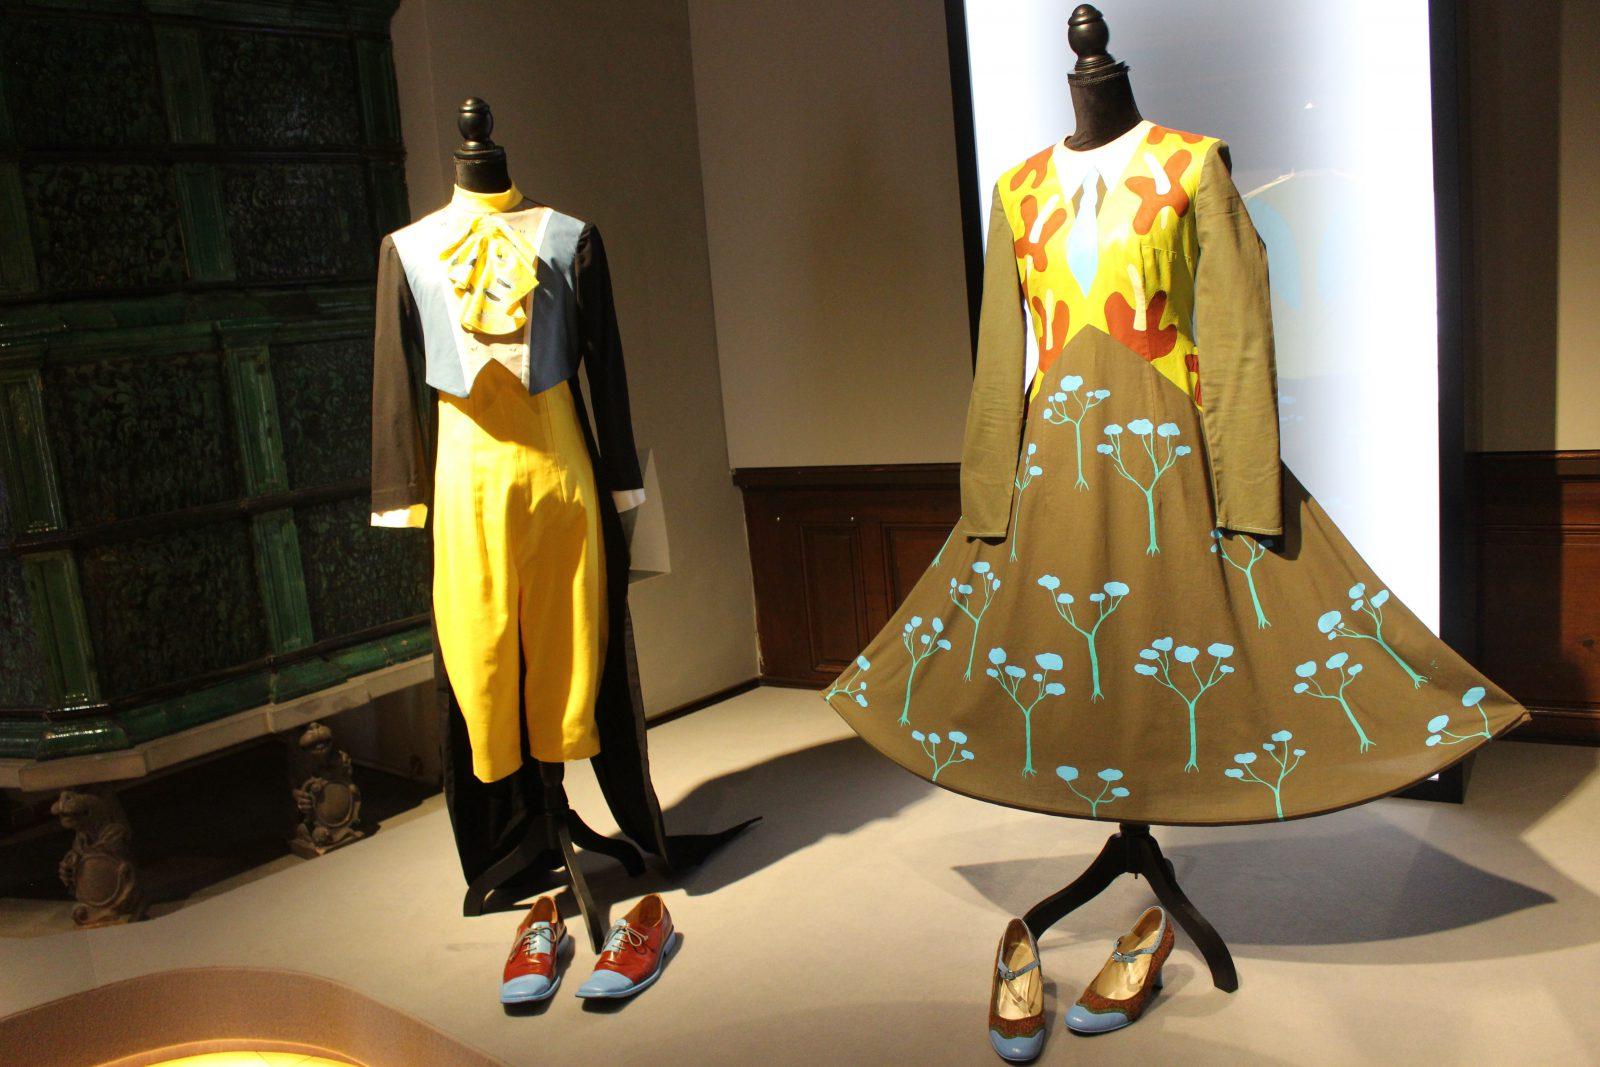 Musée Forel Morges Albertine Zullo robe et costume masculin